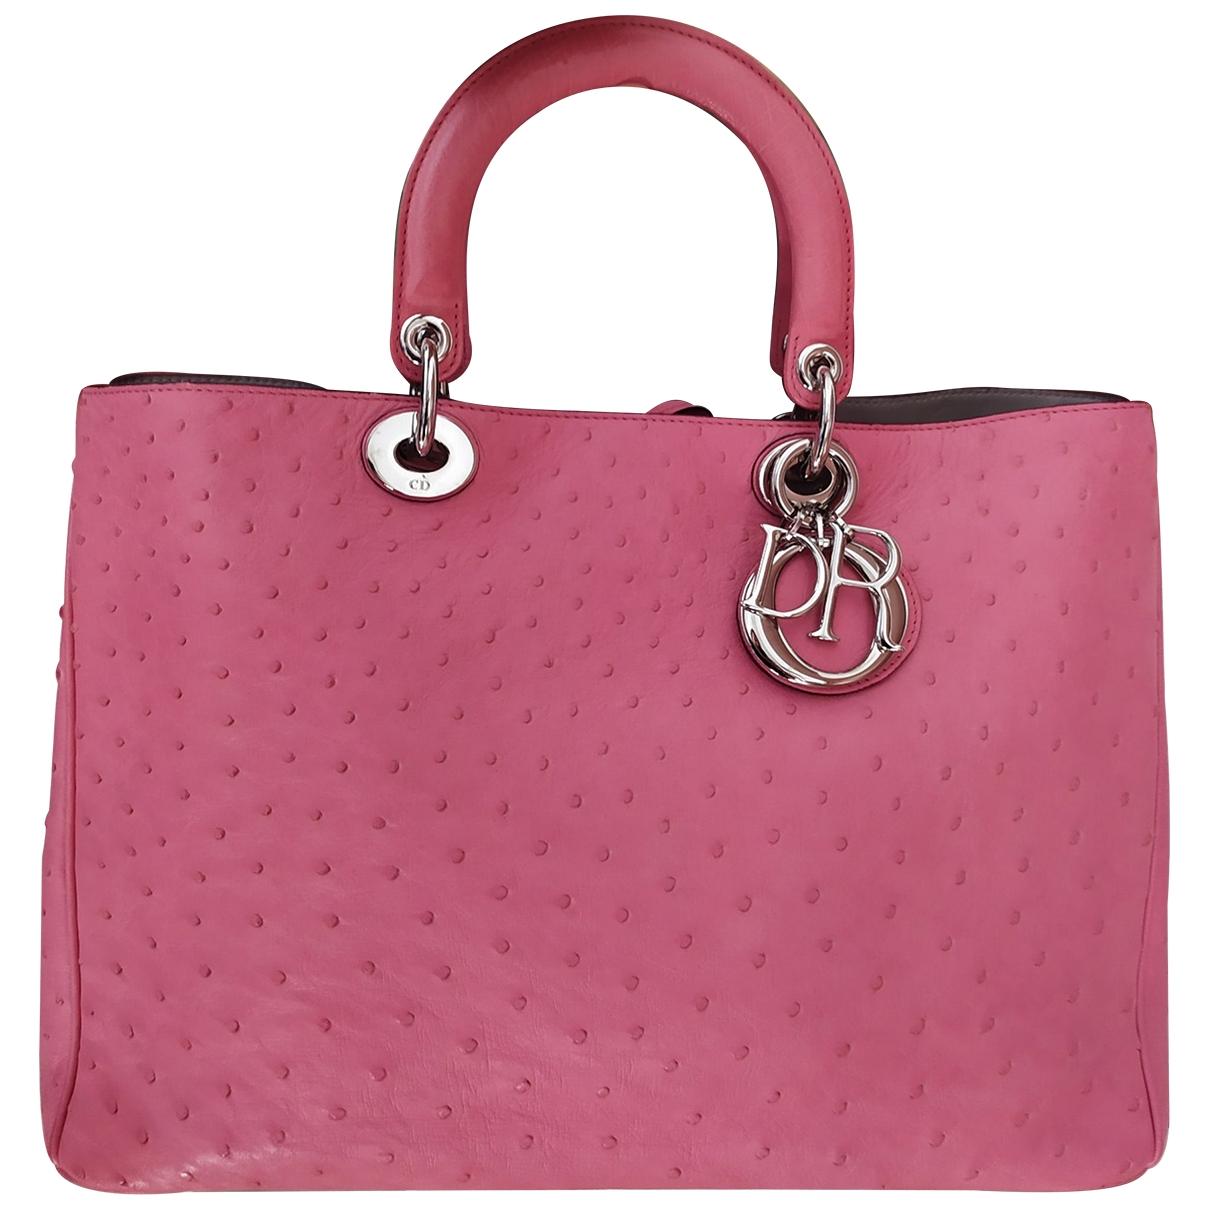 Dior - Sac a main Diorissimo pour femme en autruche - rose